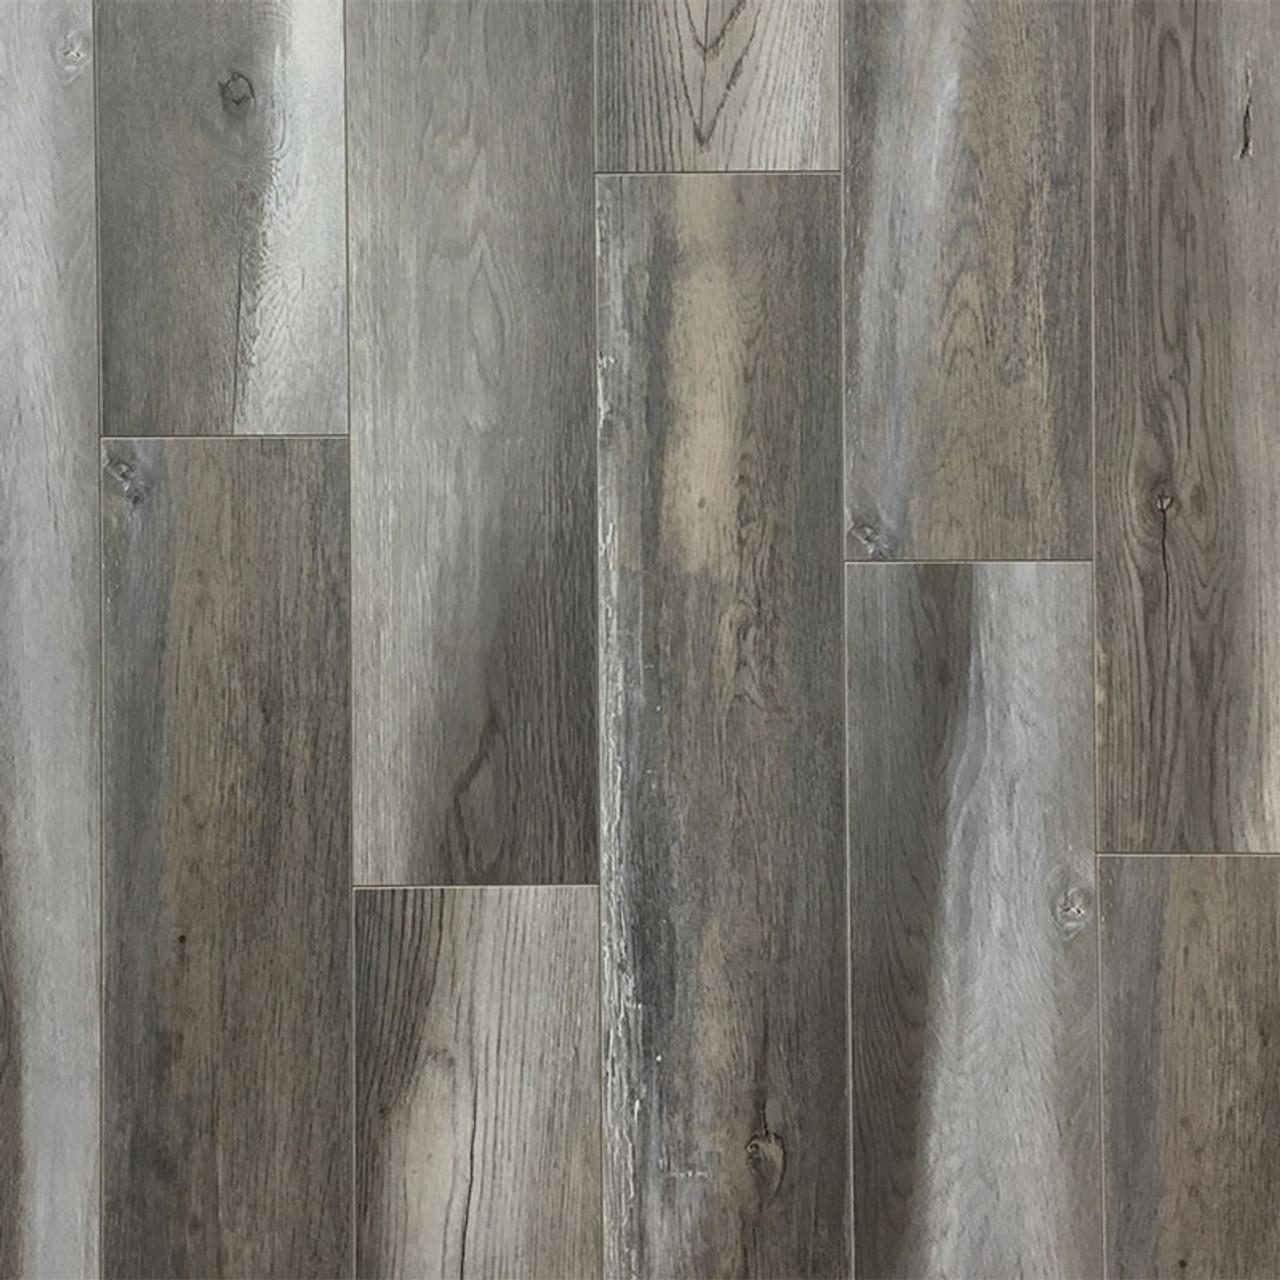 12mm Union Unik Laminate Flooring | 18.99 Sq.Ft. Per Box | Sold by the Box